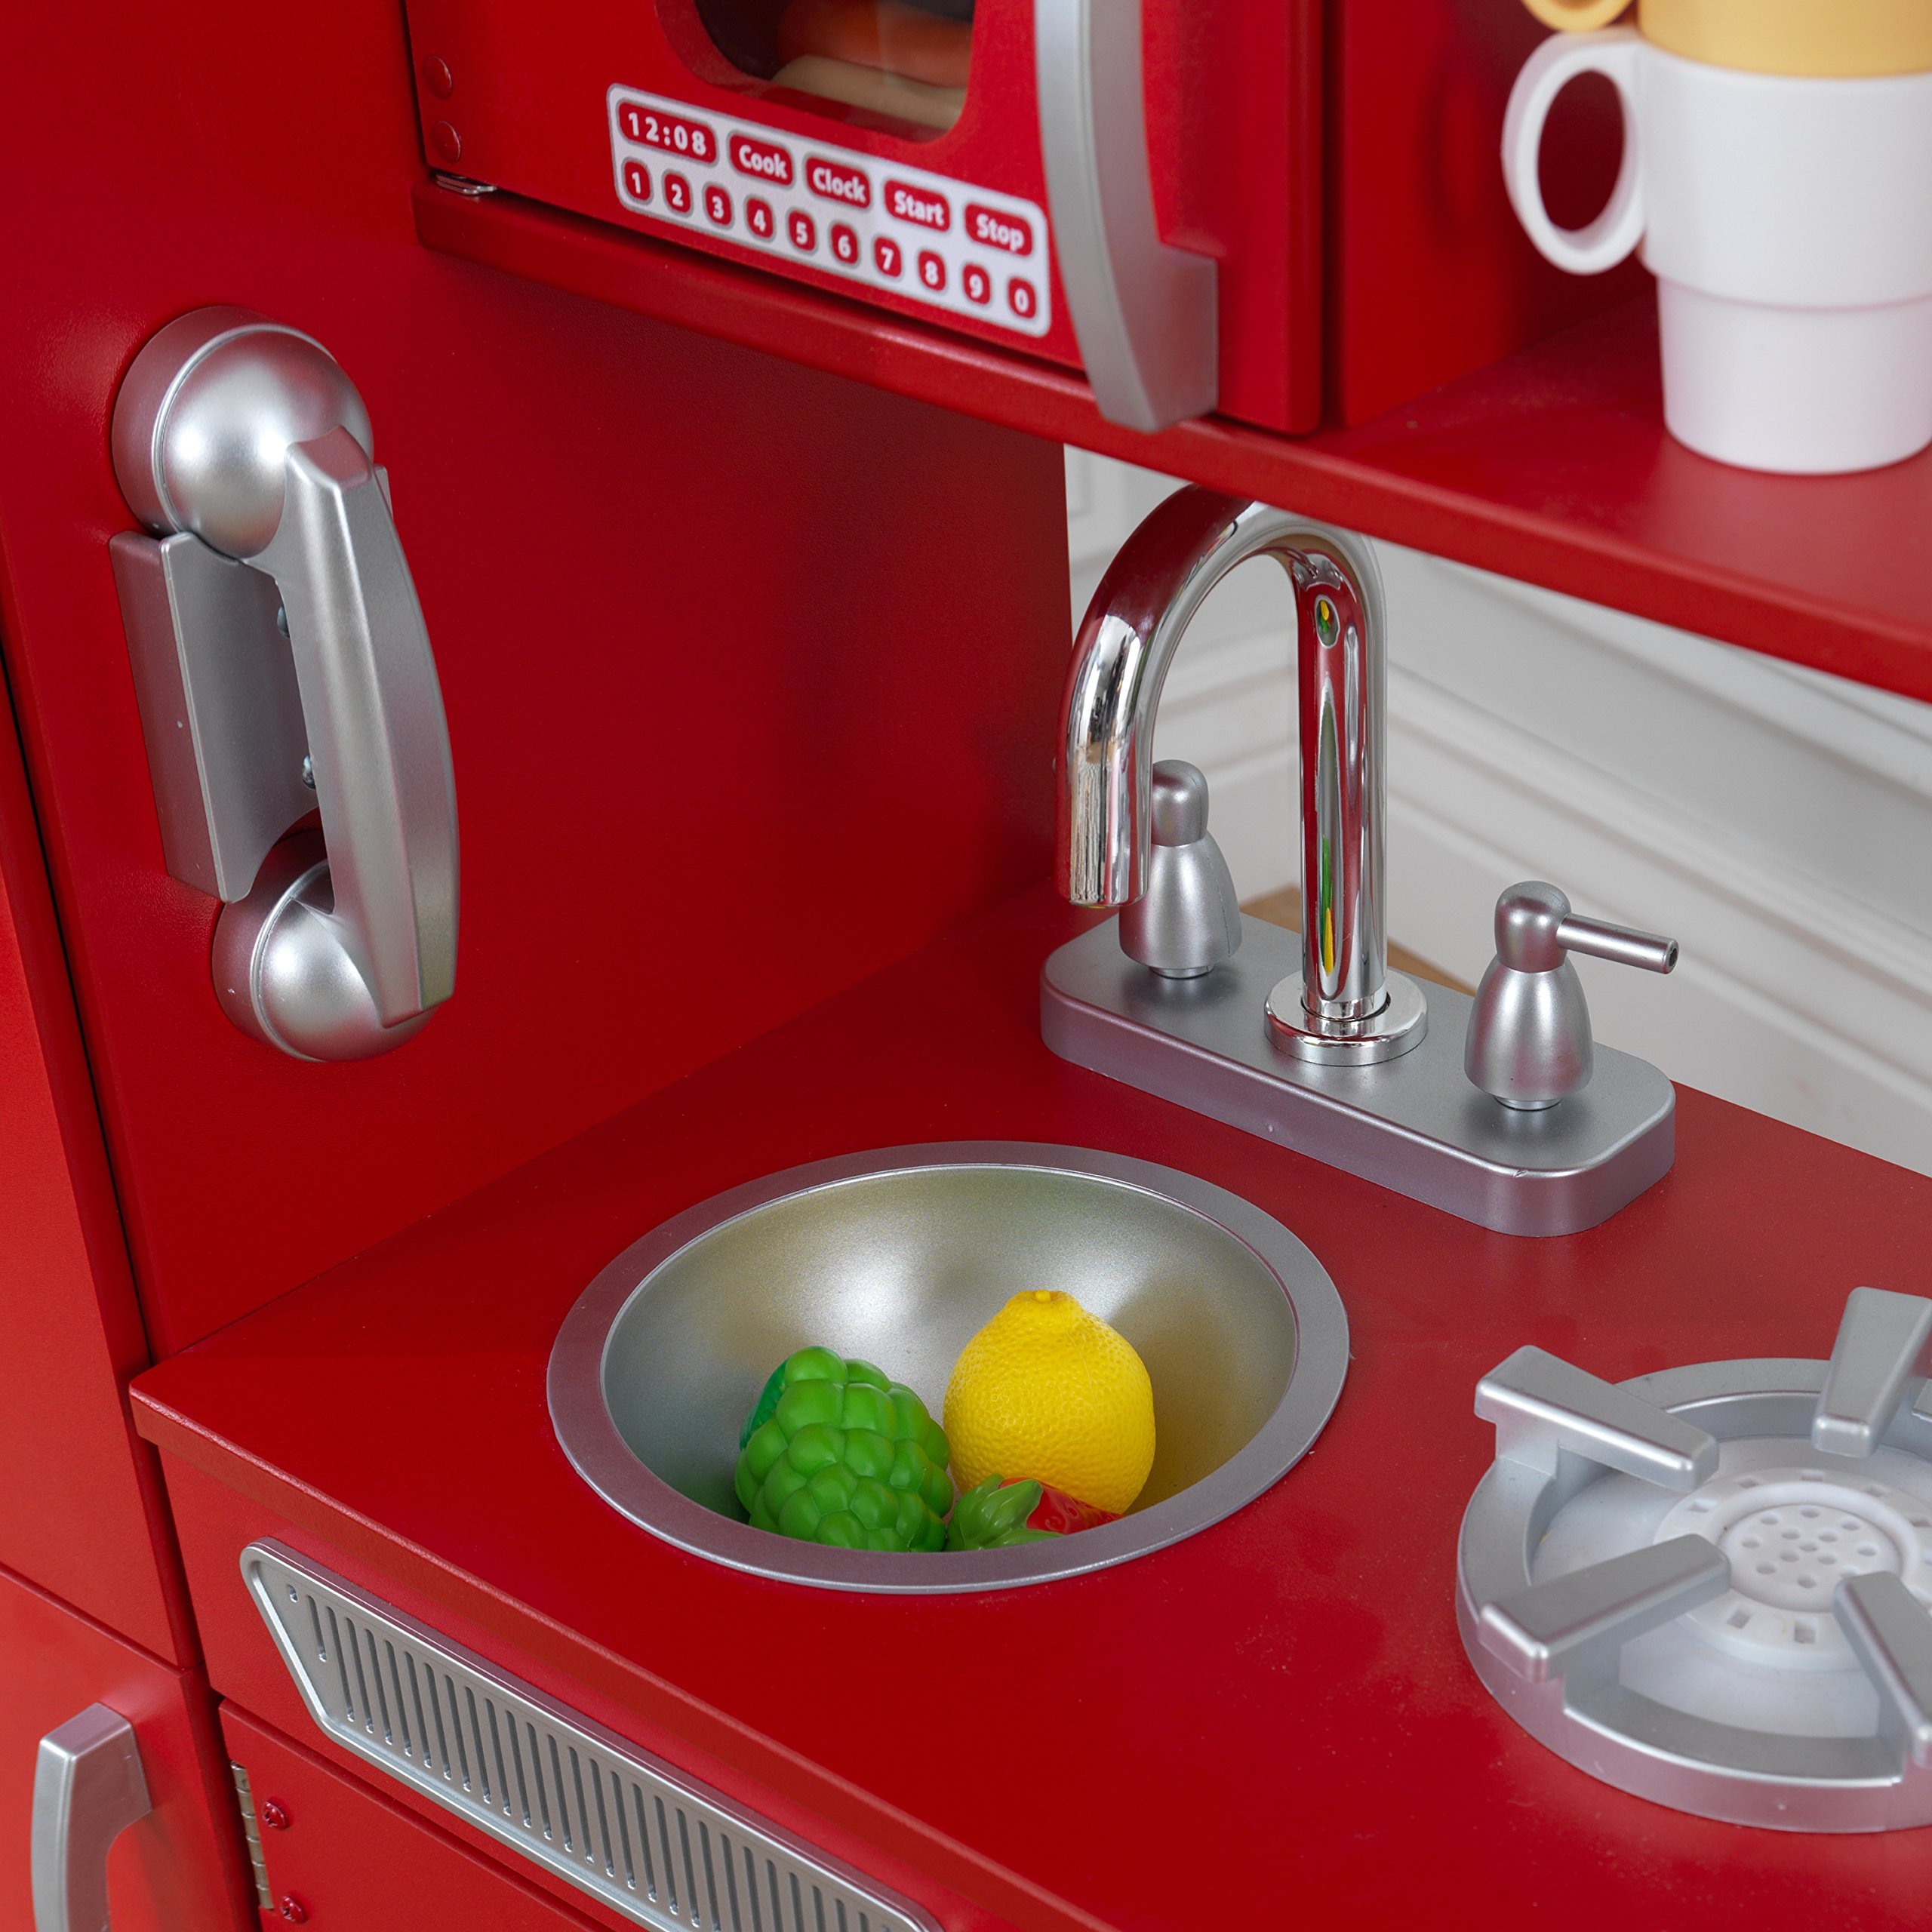 KidKraft Vintage Play Kitchen - Red by KidKraft (Image #7)